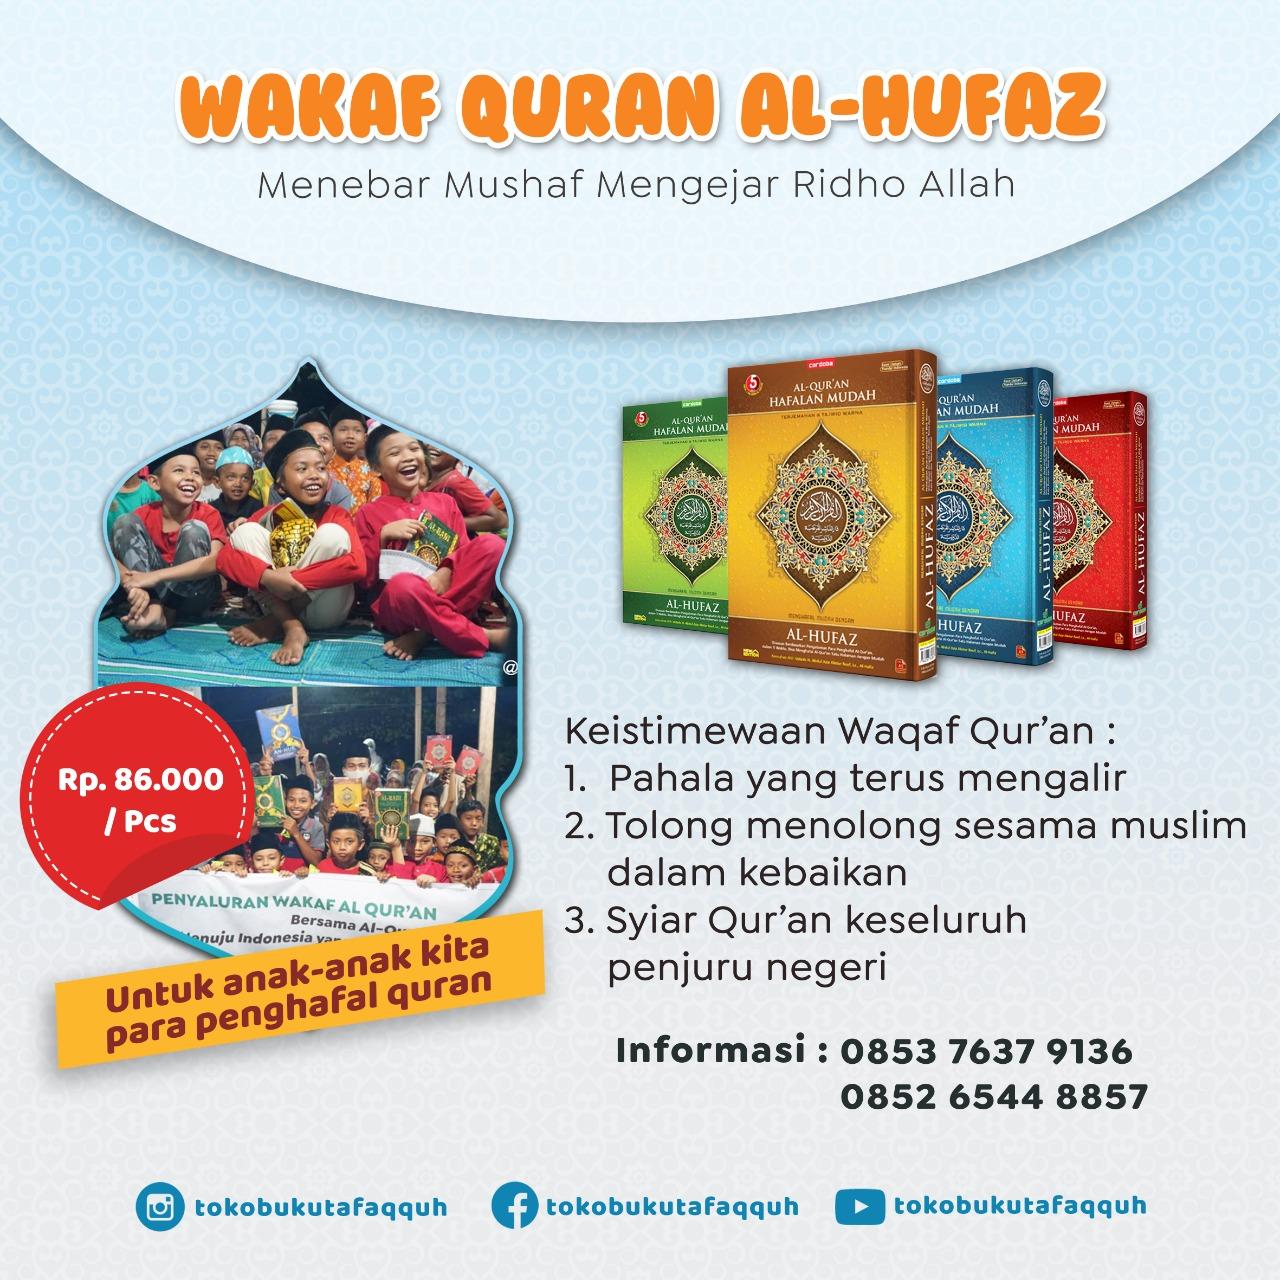 Tentang Program Wakaf Al-Quran Tafaqquh